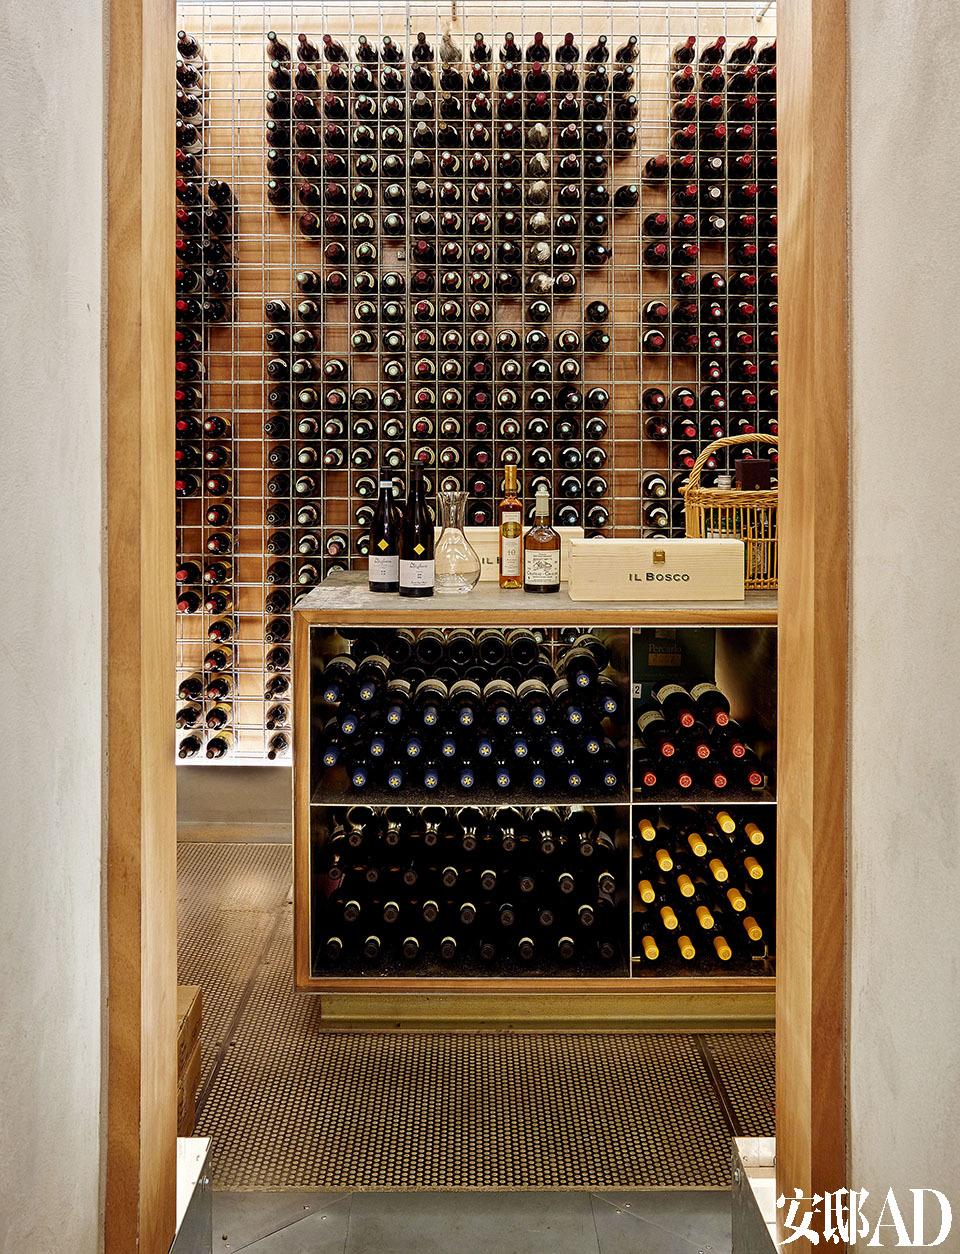 Calabresi父子最著名的创造,是用西拉葡萄酿造的红葡萄酒Il Bosco,以及用维欧尼品种老藤白葡萄酿造的白葡萄酒Fontarca。私人酒窖位于房子的地下室,里面有许多收藏。